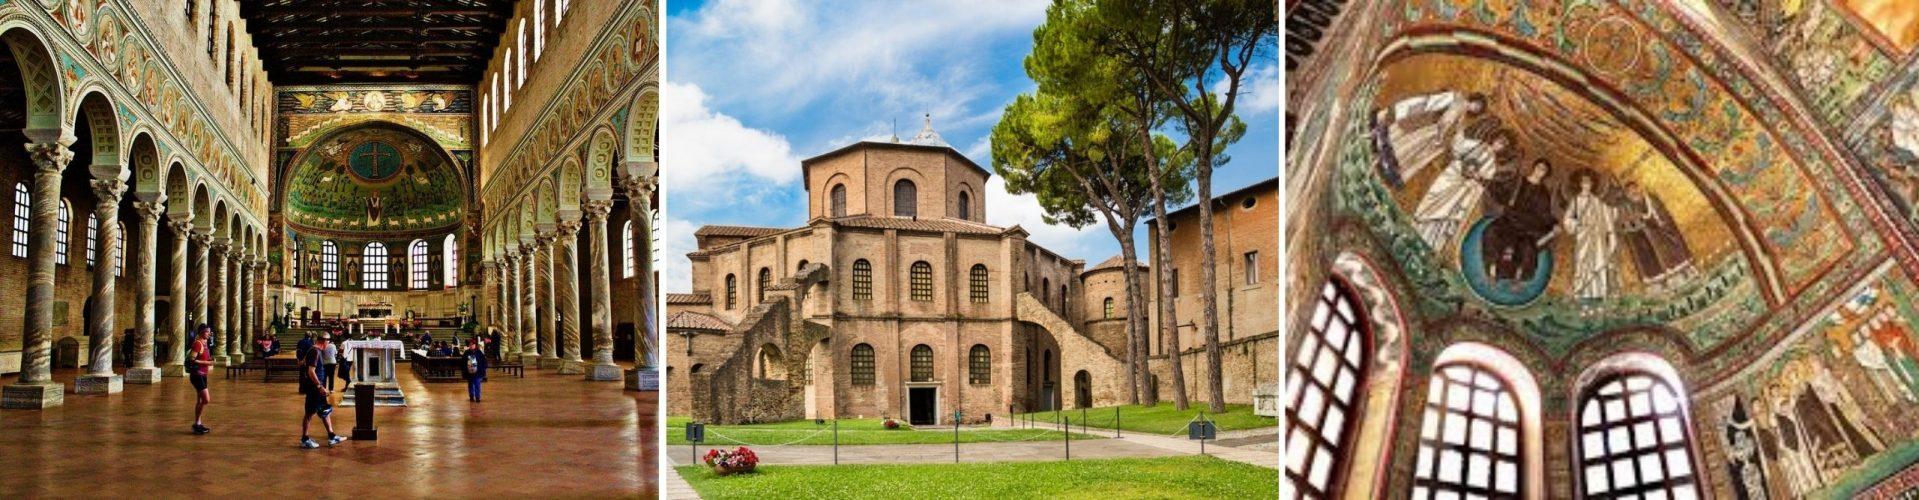 discover-romagna-ravenna-dozza-cycling-culinary-tour/1